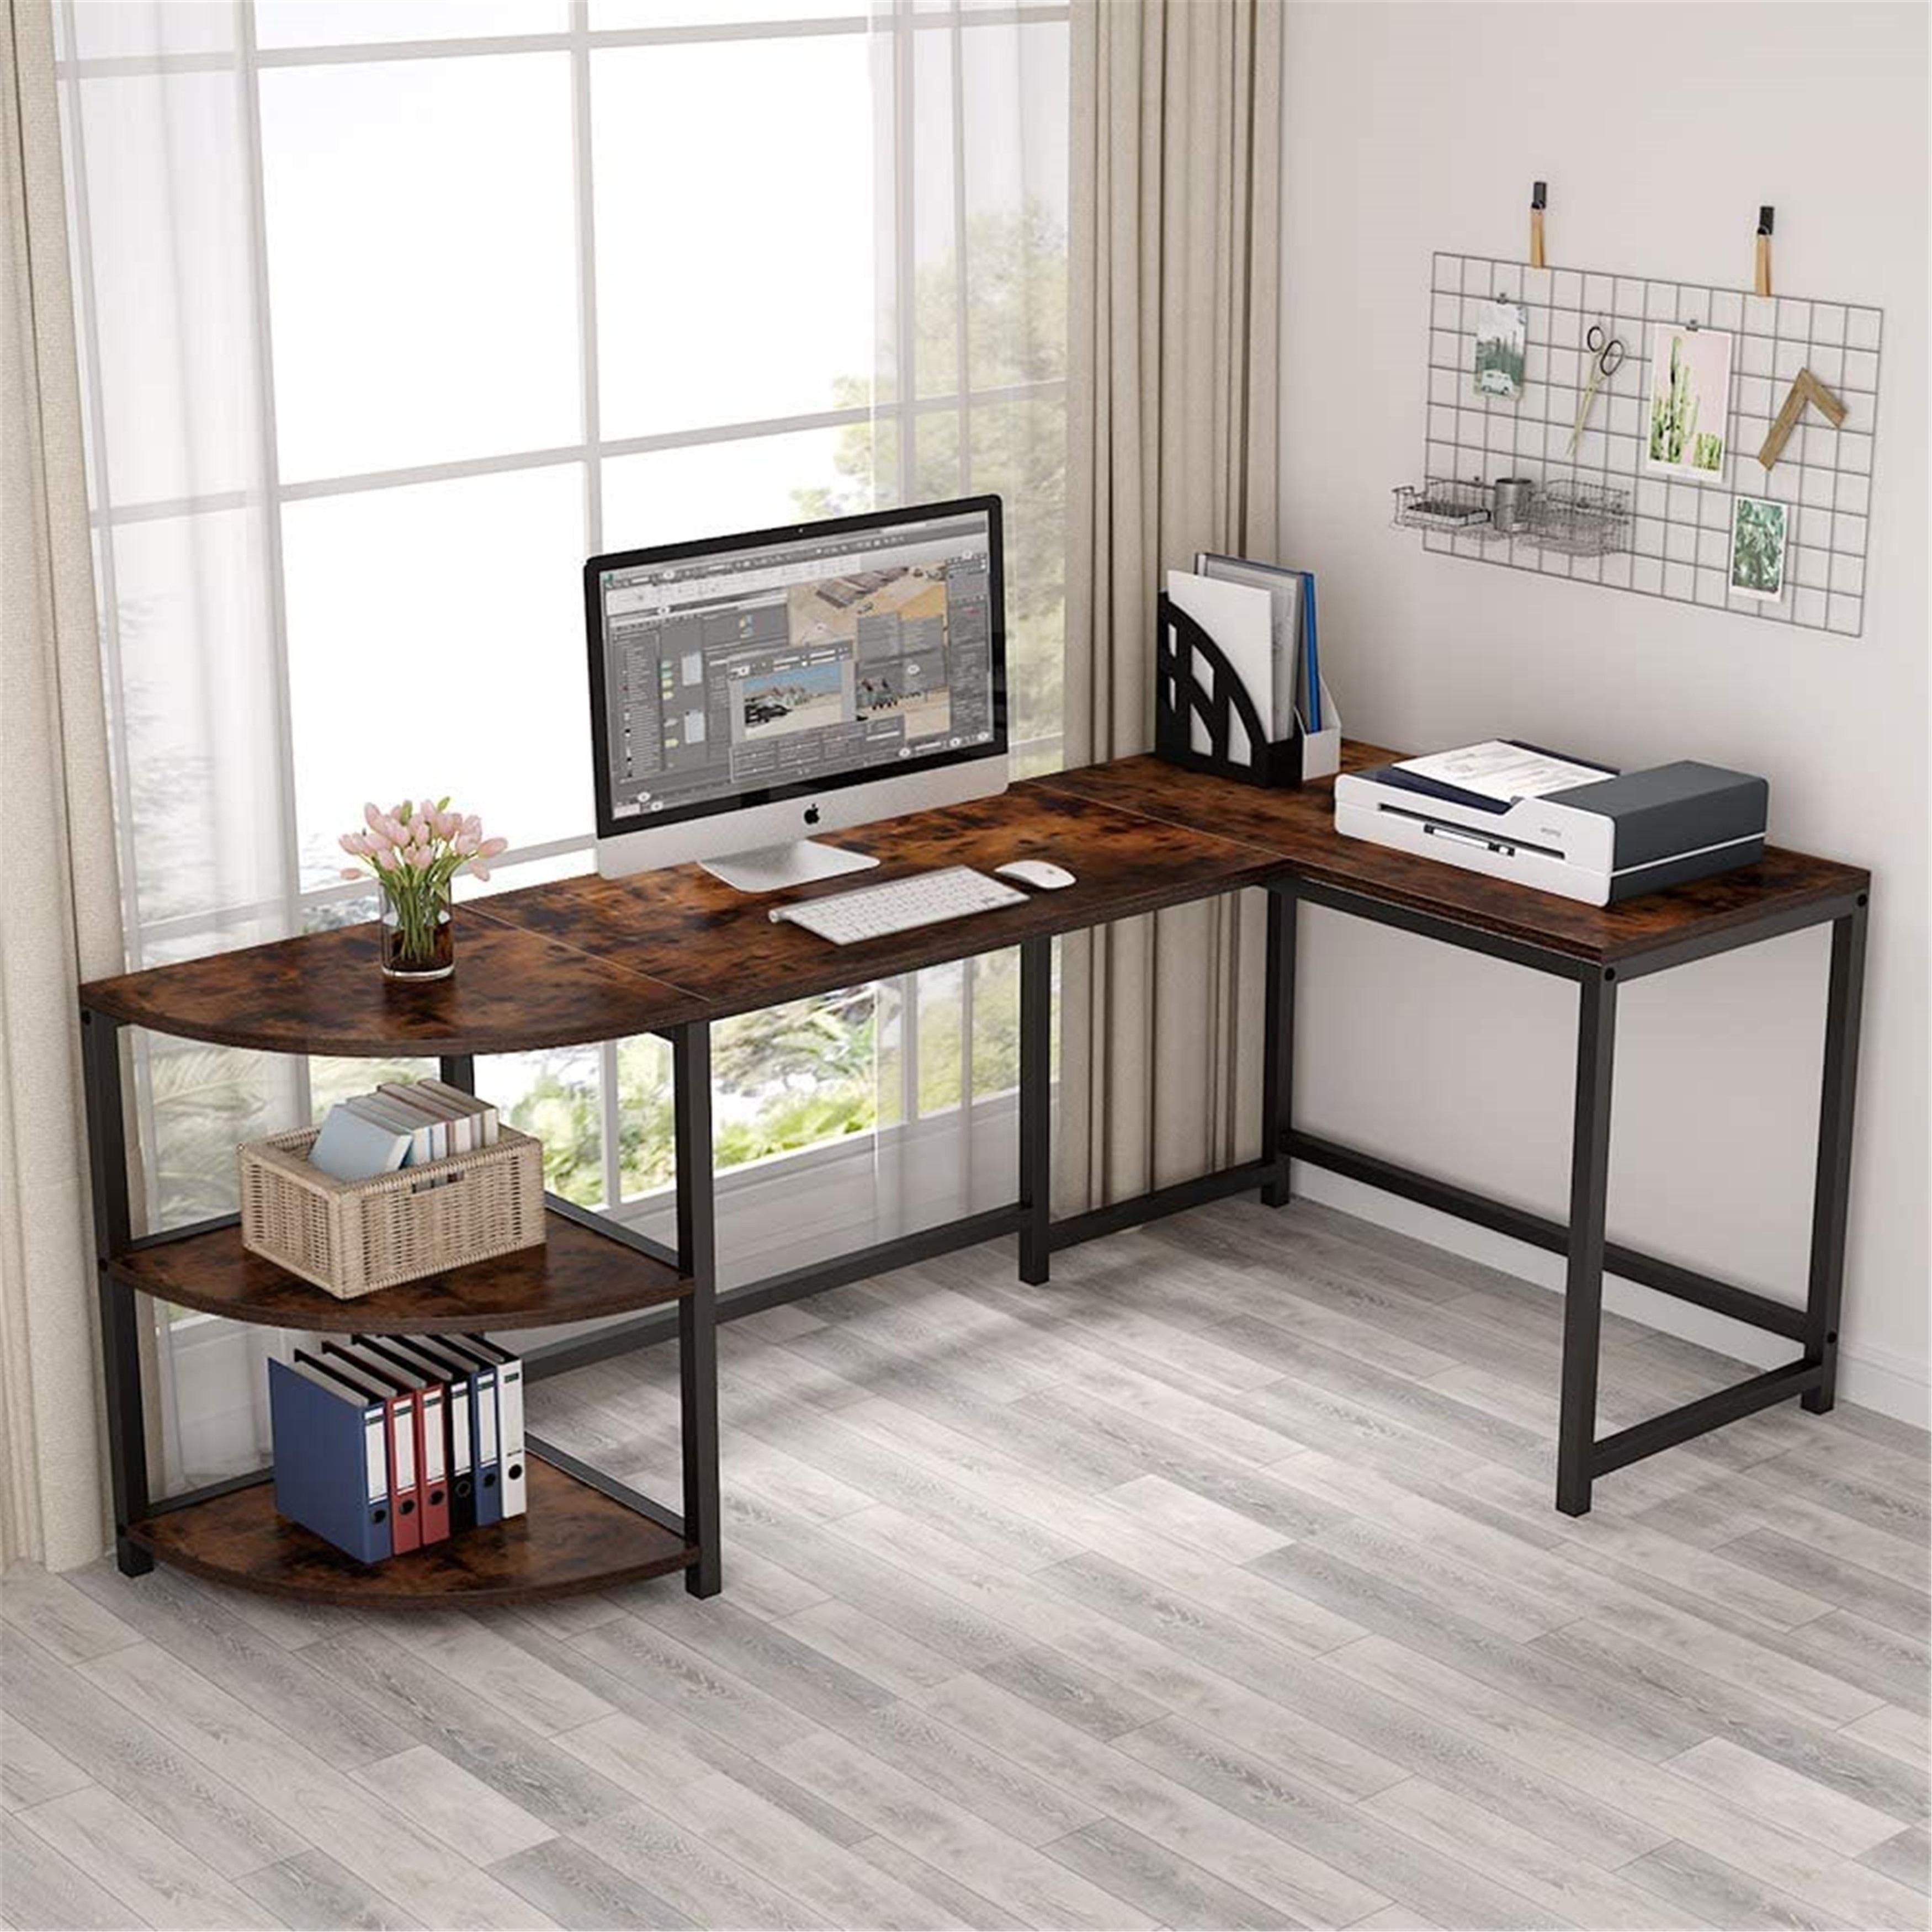 Picture of: 74 Inch L Shaped Computer Desk With Corner Shelf Corner Desk Brown Overstock 31832095